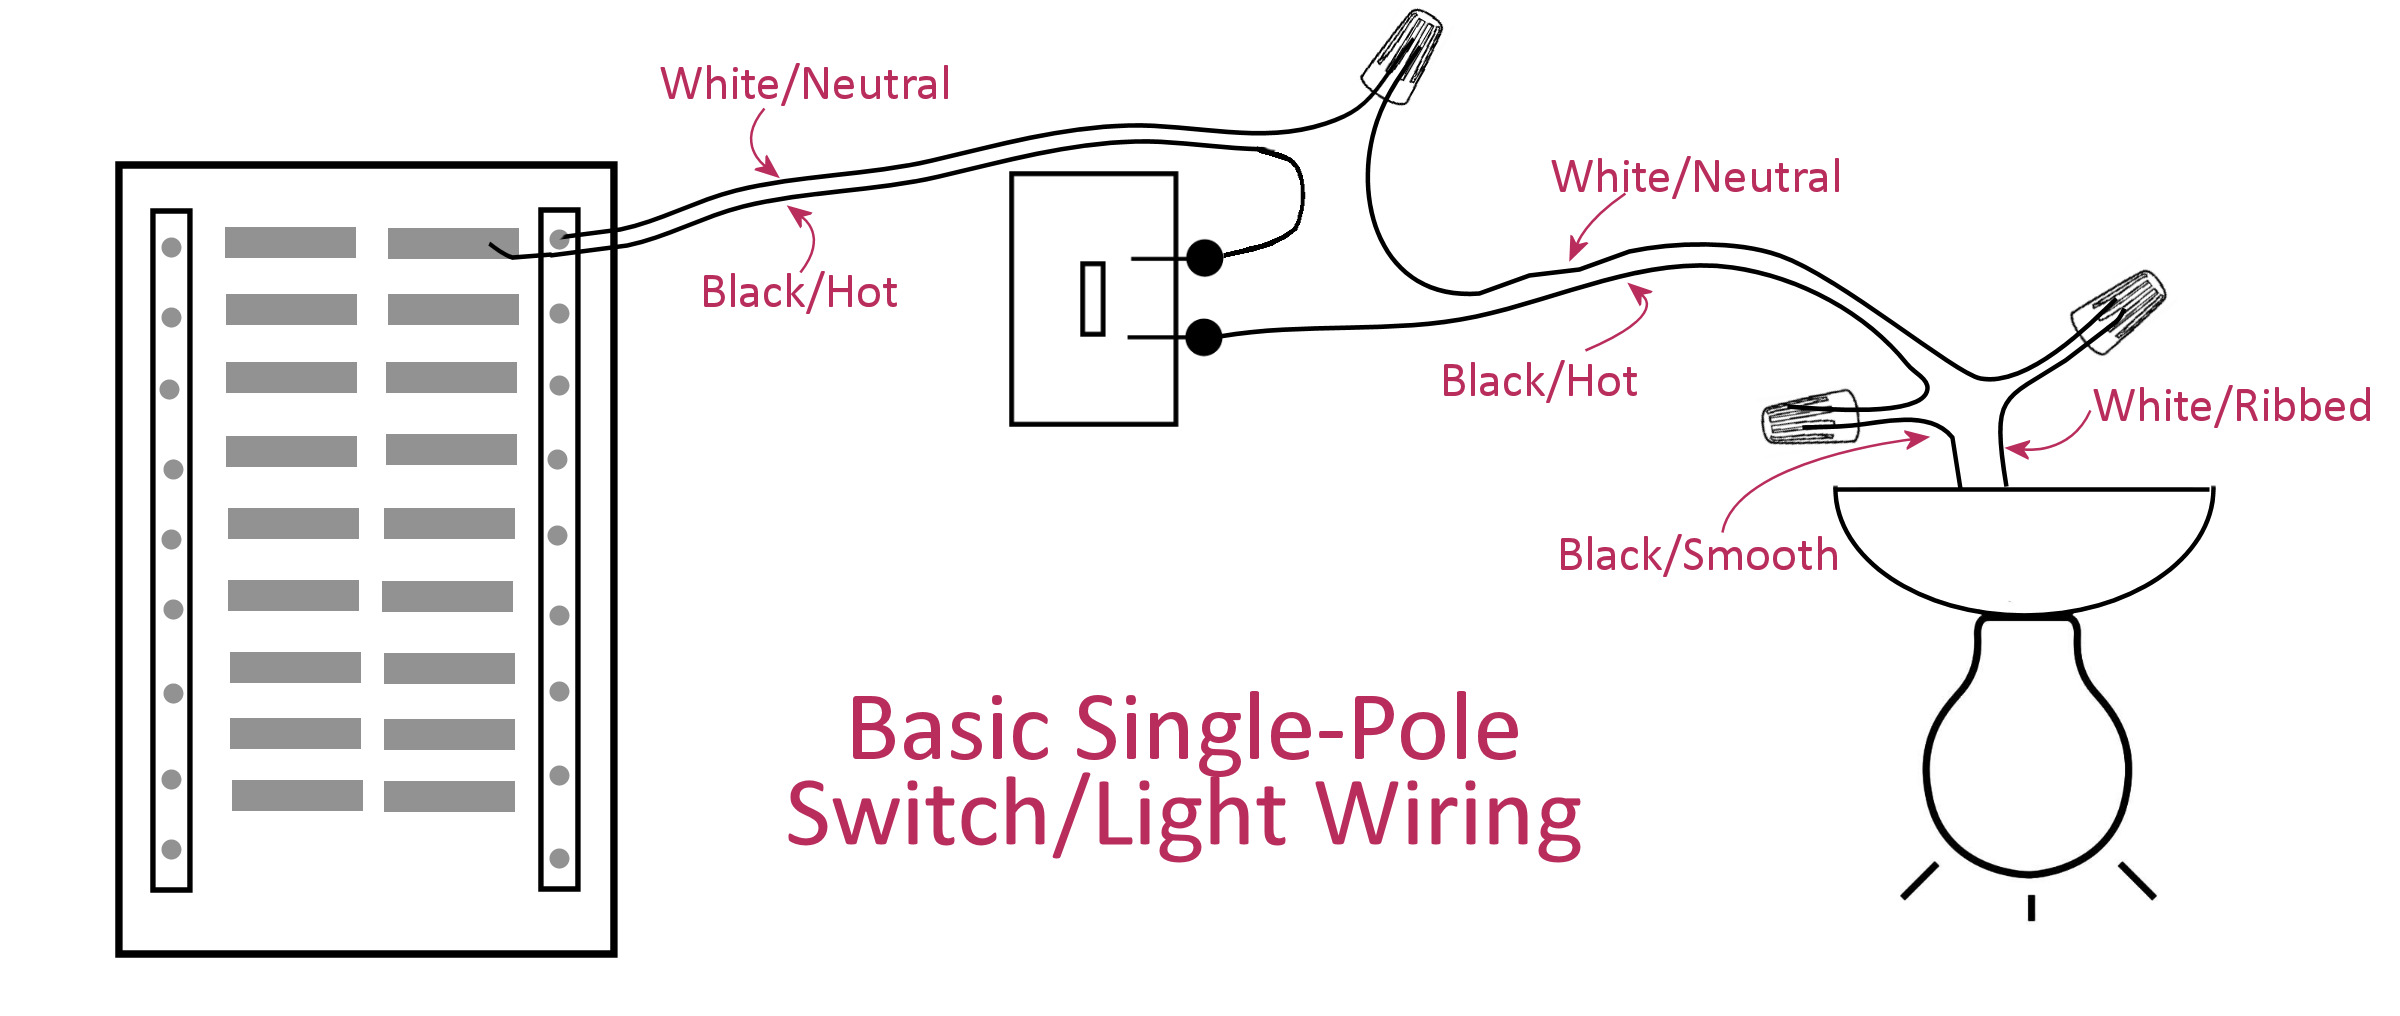 Wiring A Basic Single-Pole Light